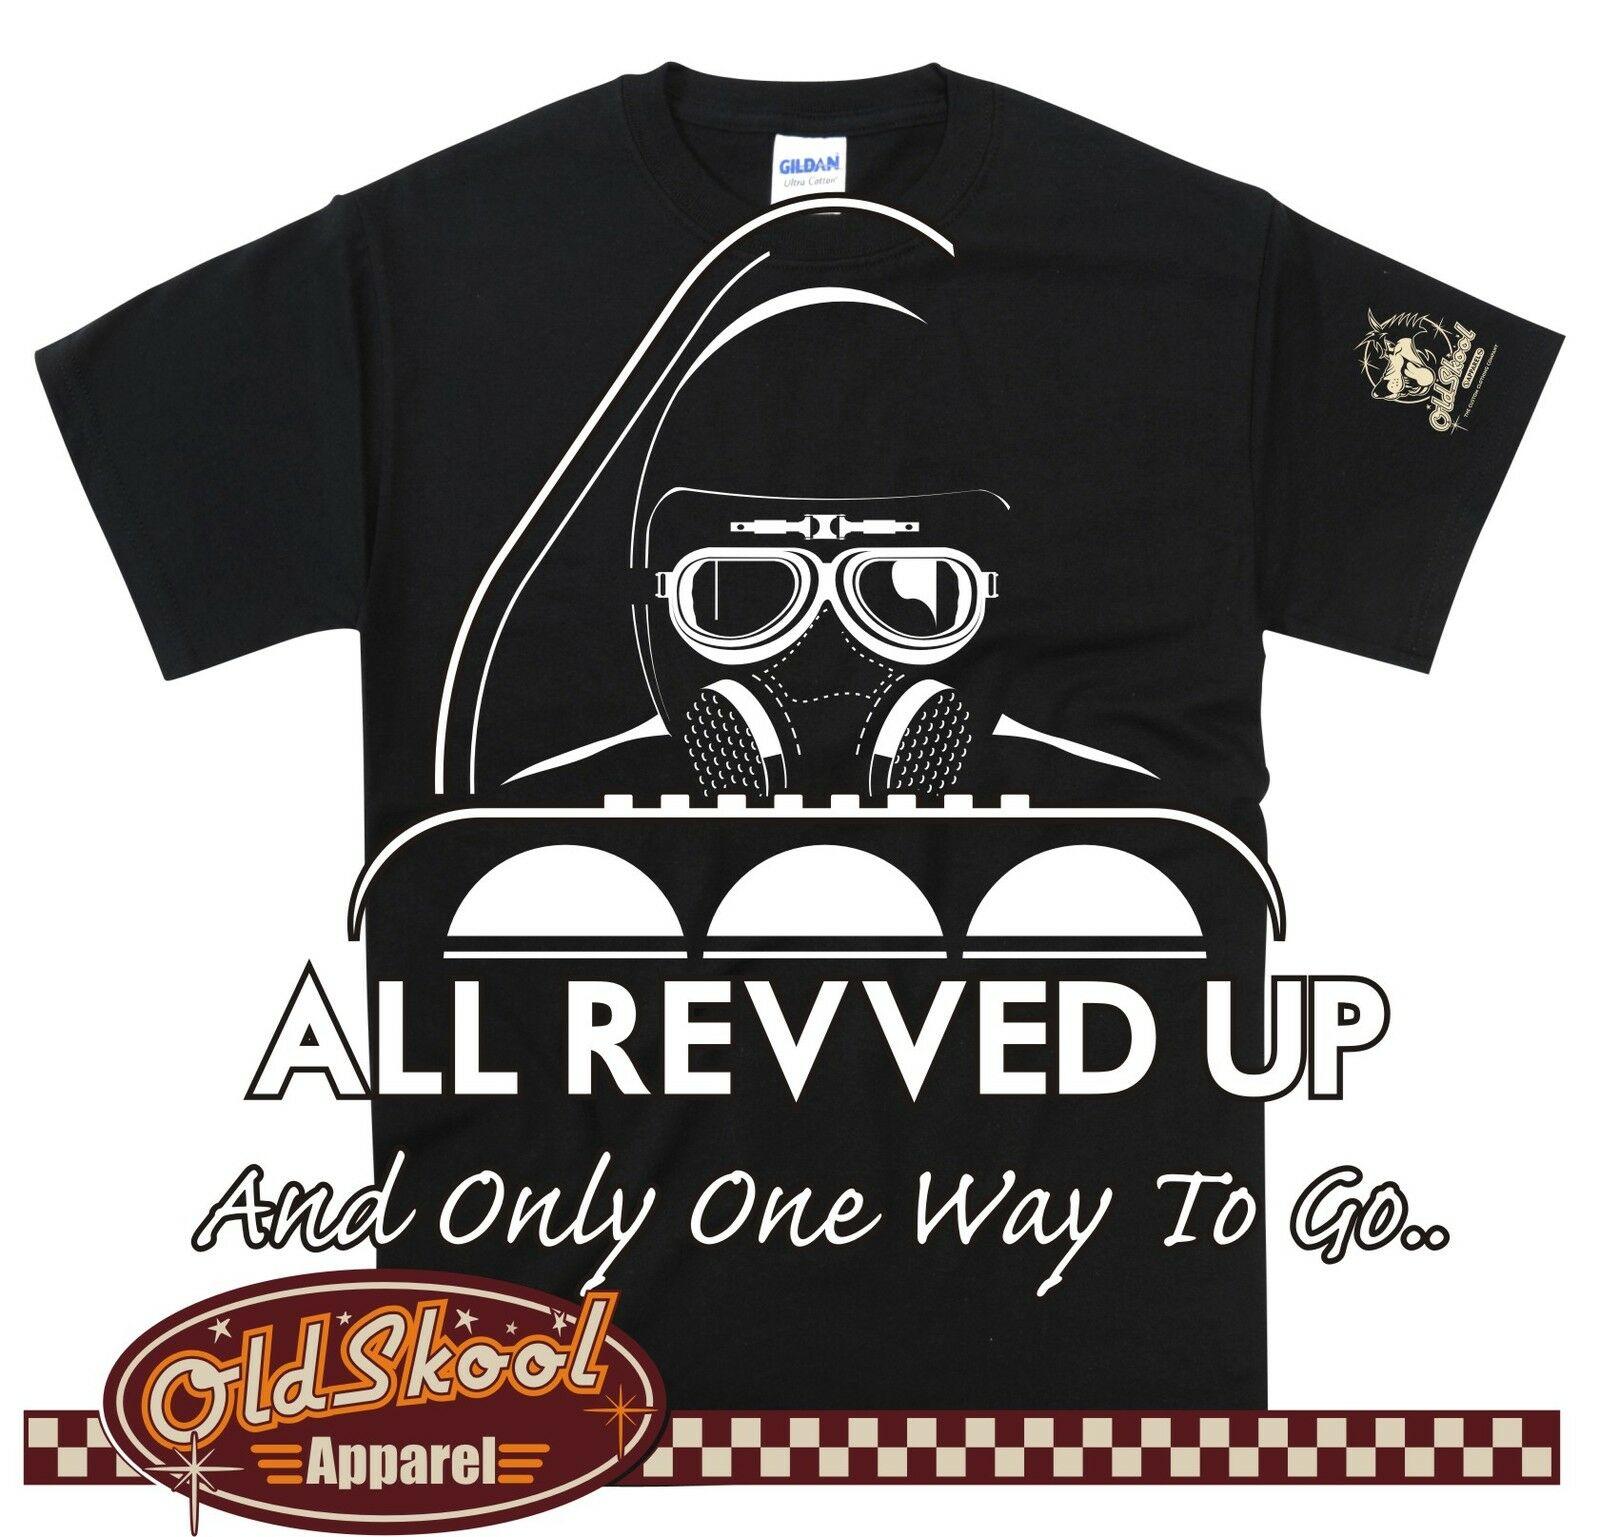 OldSkool de mujer T/clase camisa/Camiseta tipo mujeres de suave camiseta ser amable Drag Racer Hot Rod gasolina cabeza FunnyCar T camisa Dragster